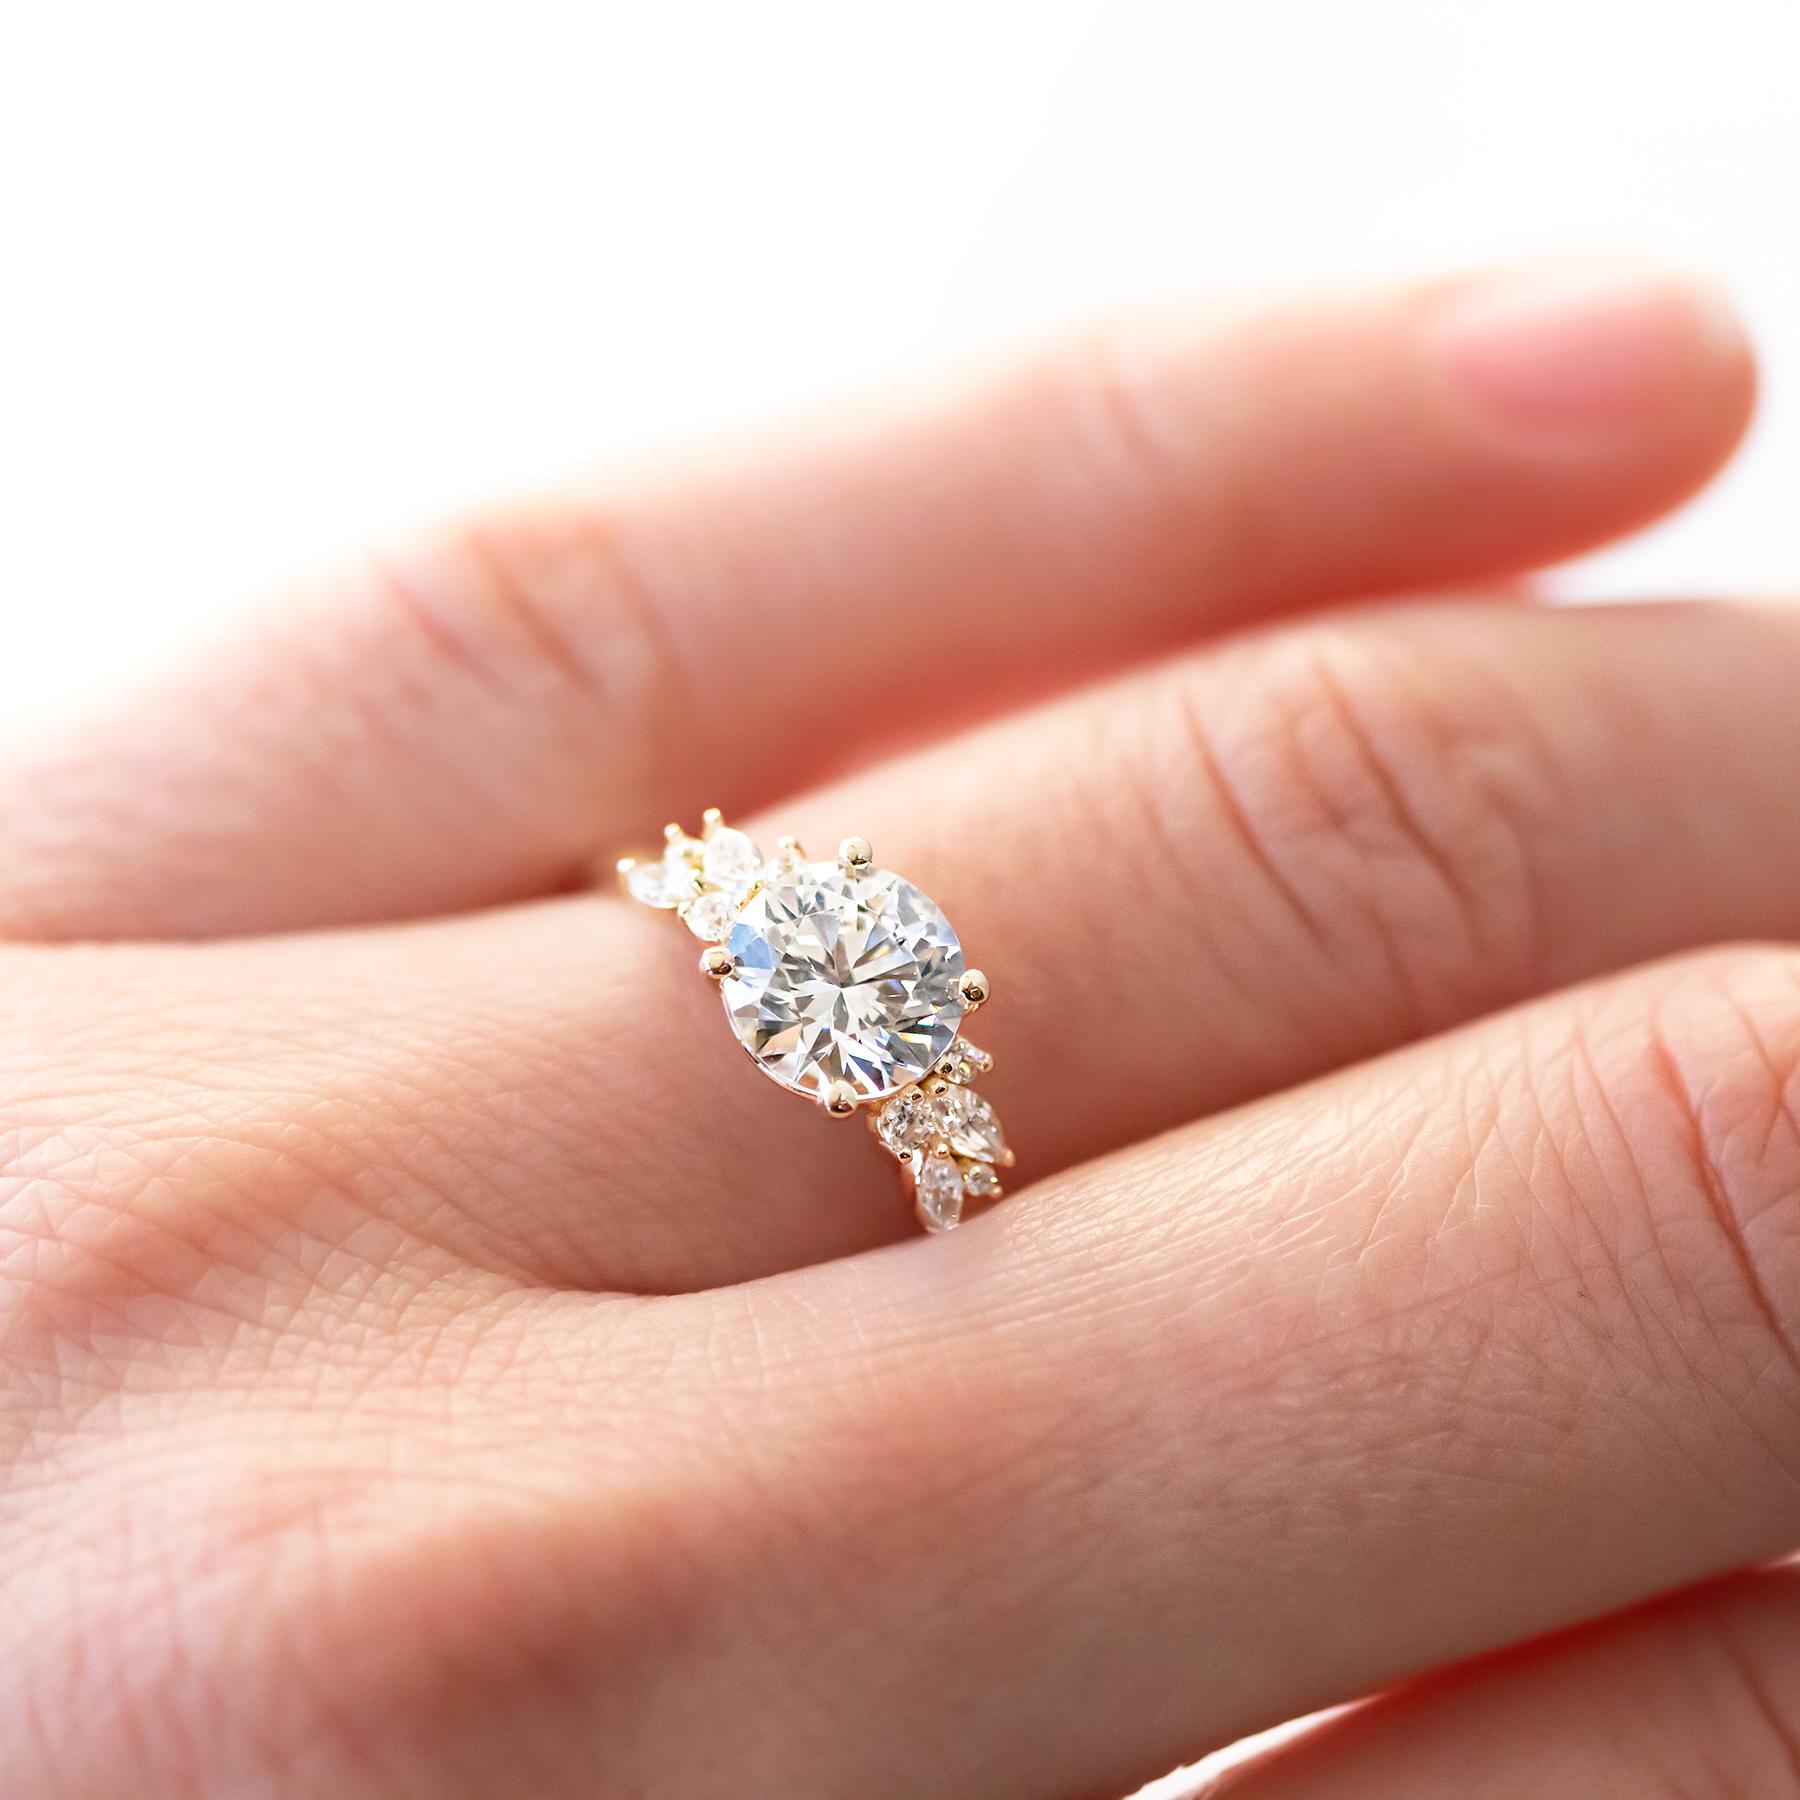 18k White Gold Luxe Celtic Love Knot Diamond Ring Morganite Engagement Ring Rose Gold Antique Halo Engagement Rings Engagement Rings Vintage Halo